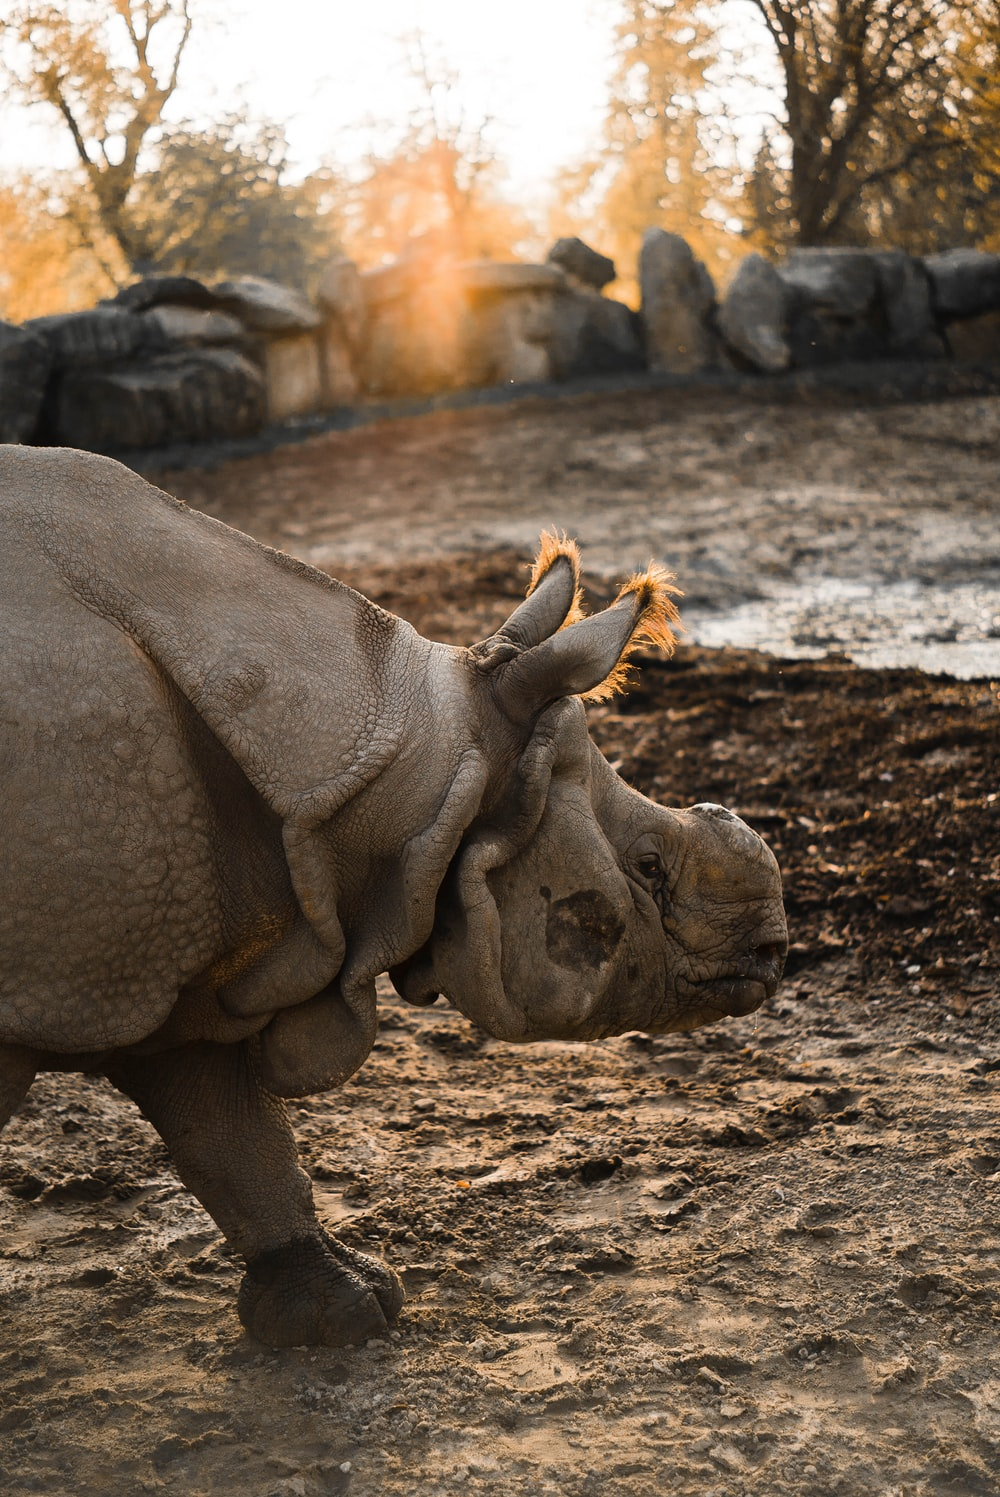 gray rhinoceros on ground